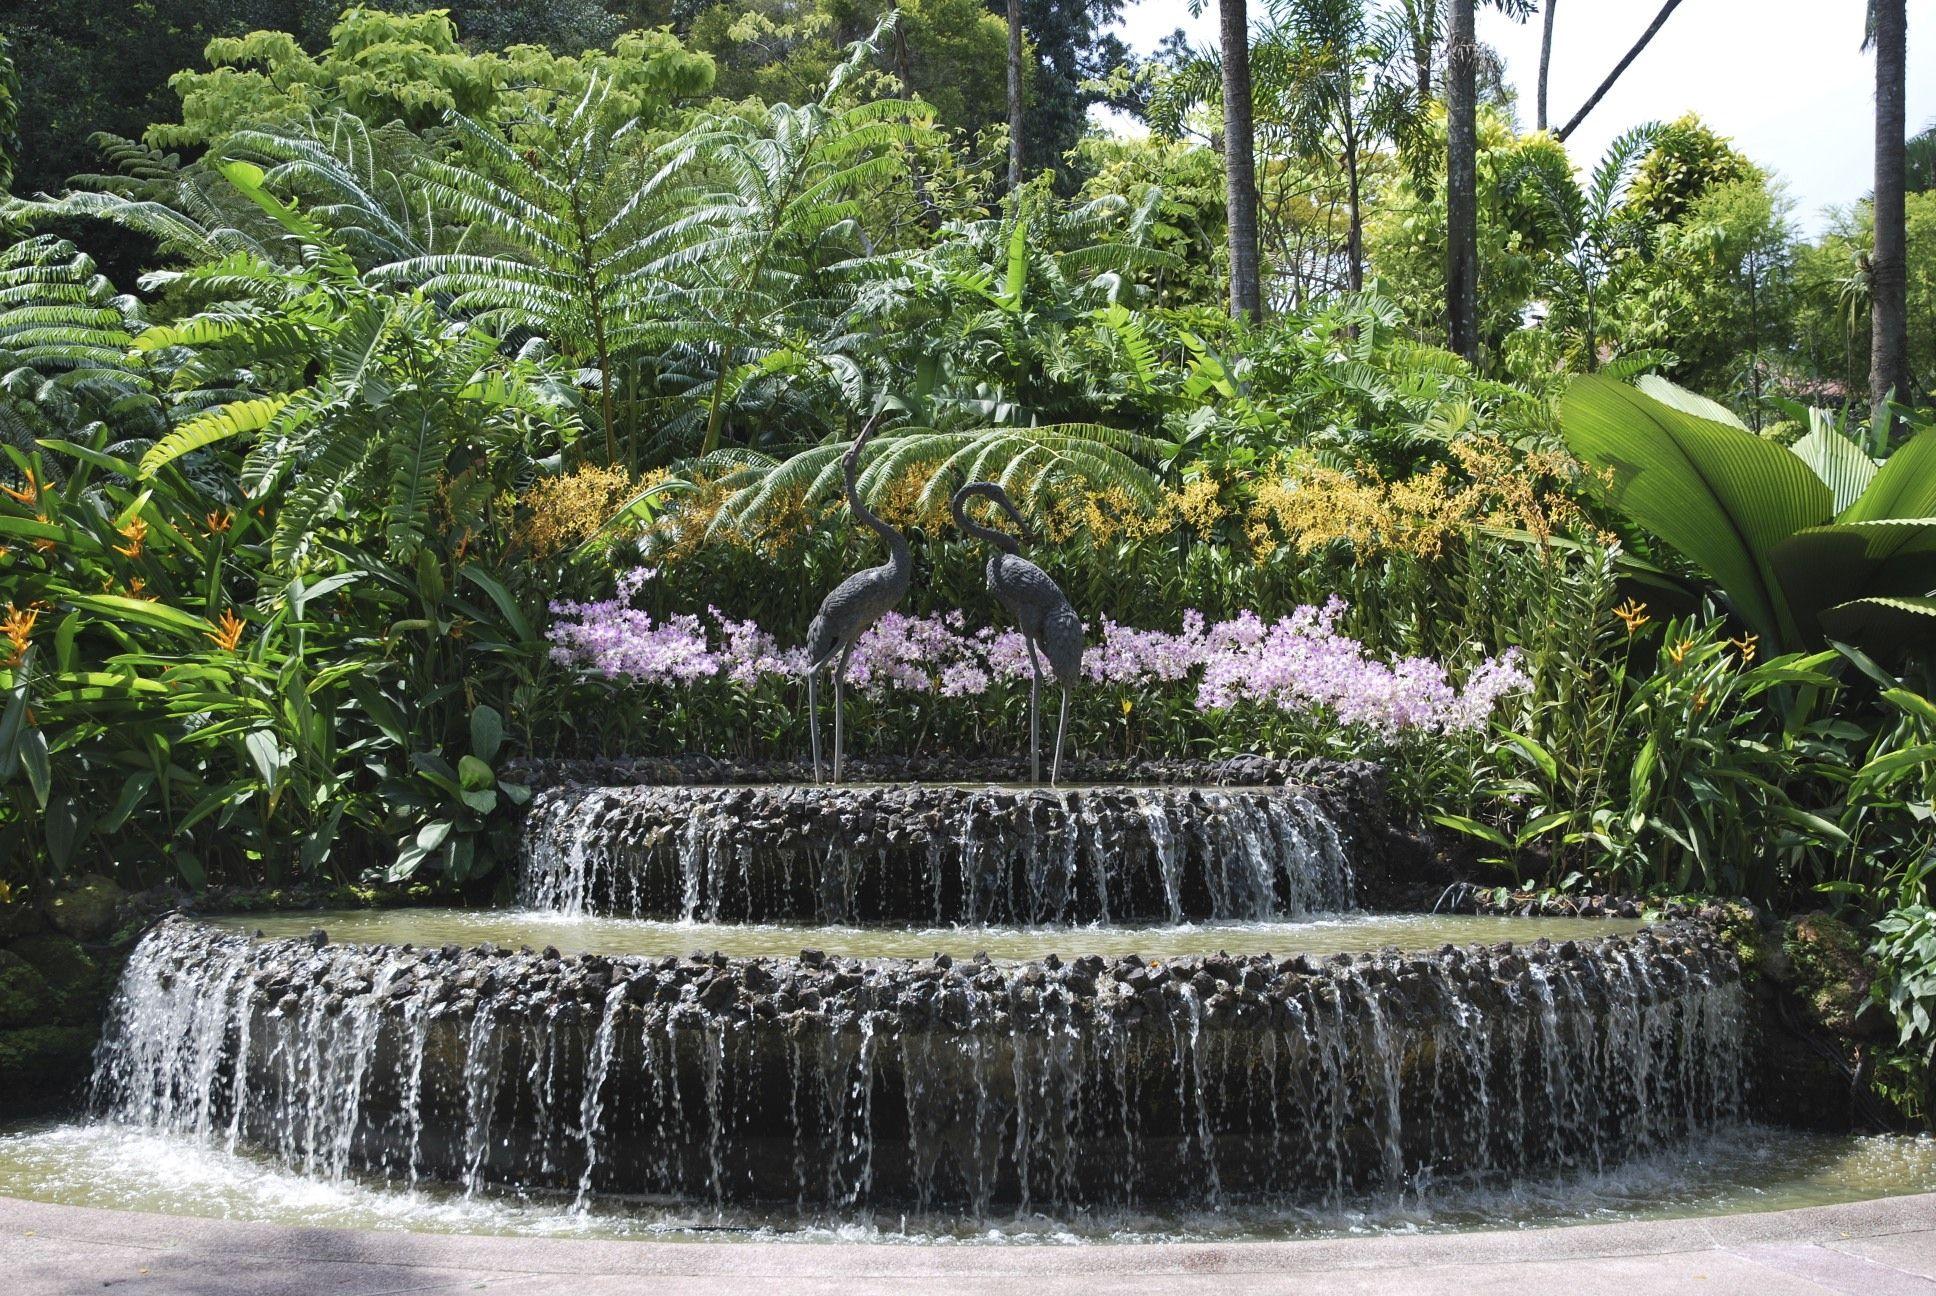 Kepler House Wallpaper: Garden Waterfall - how to make it? | Gardens ...